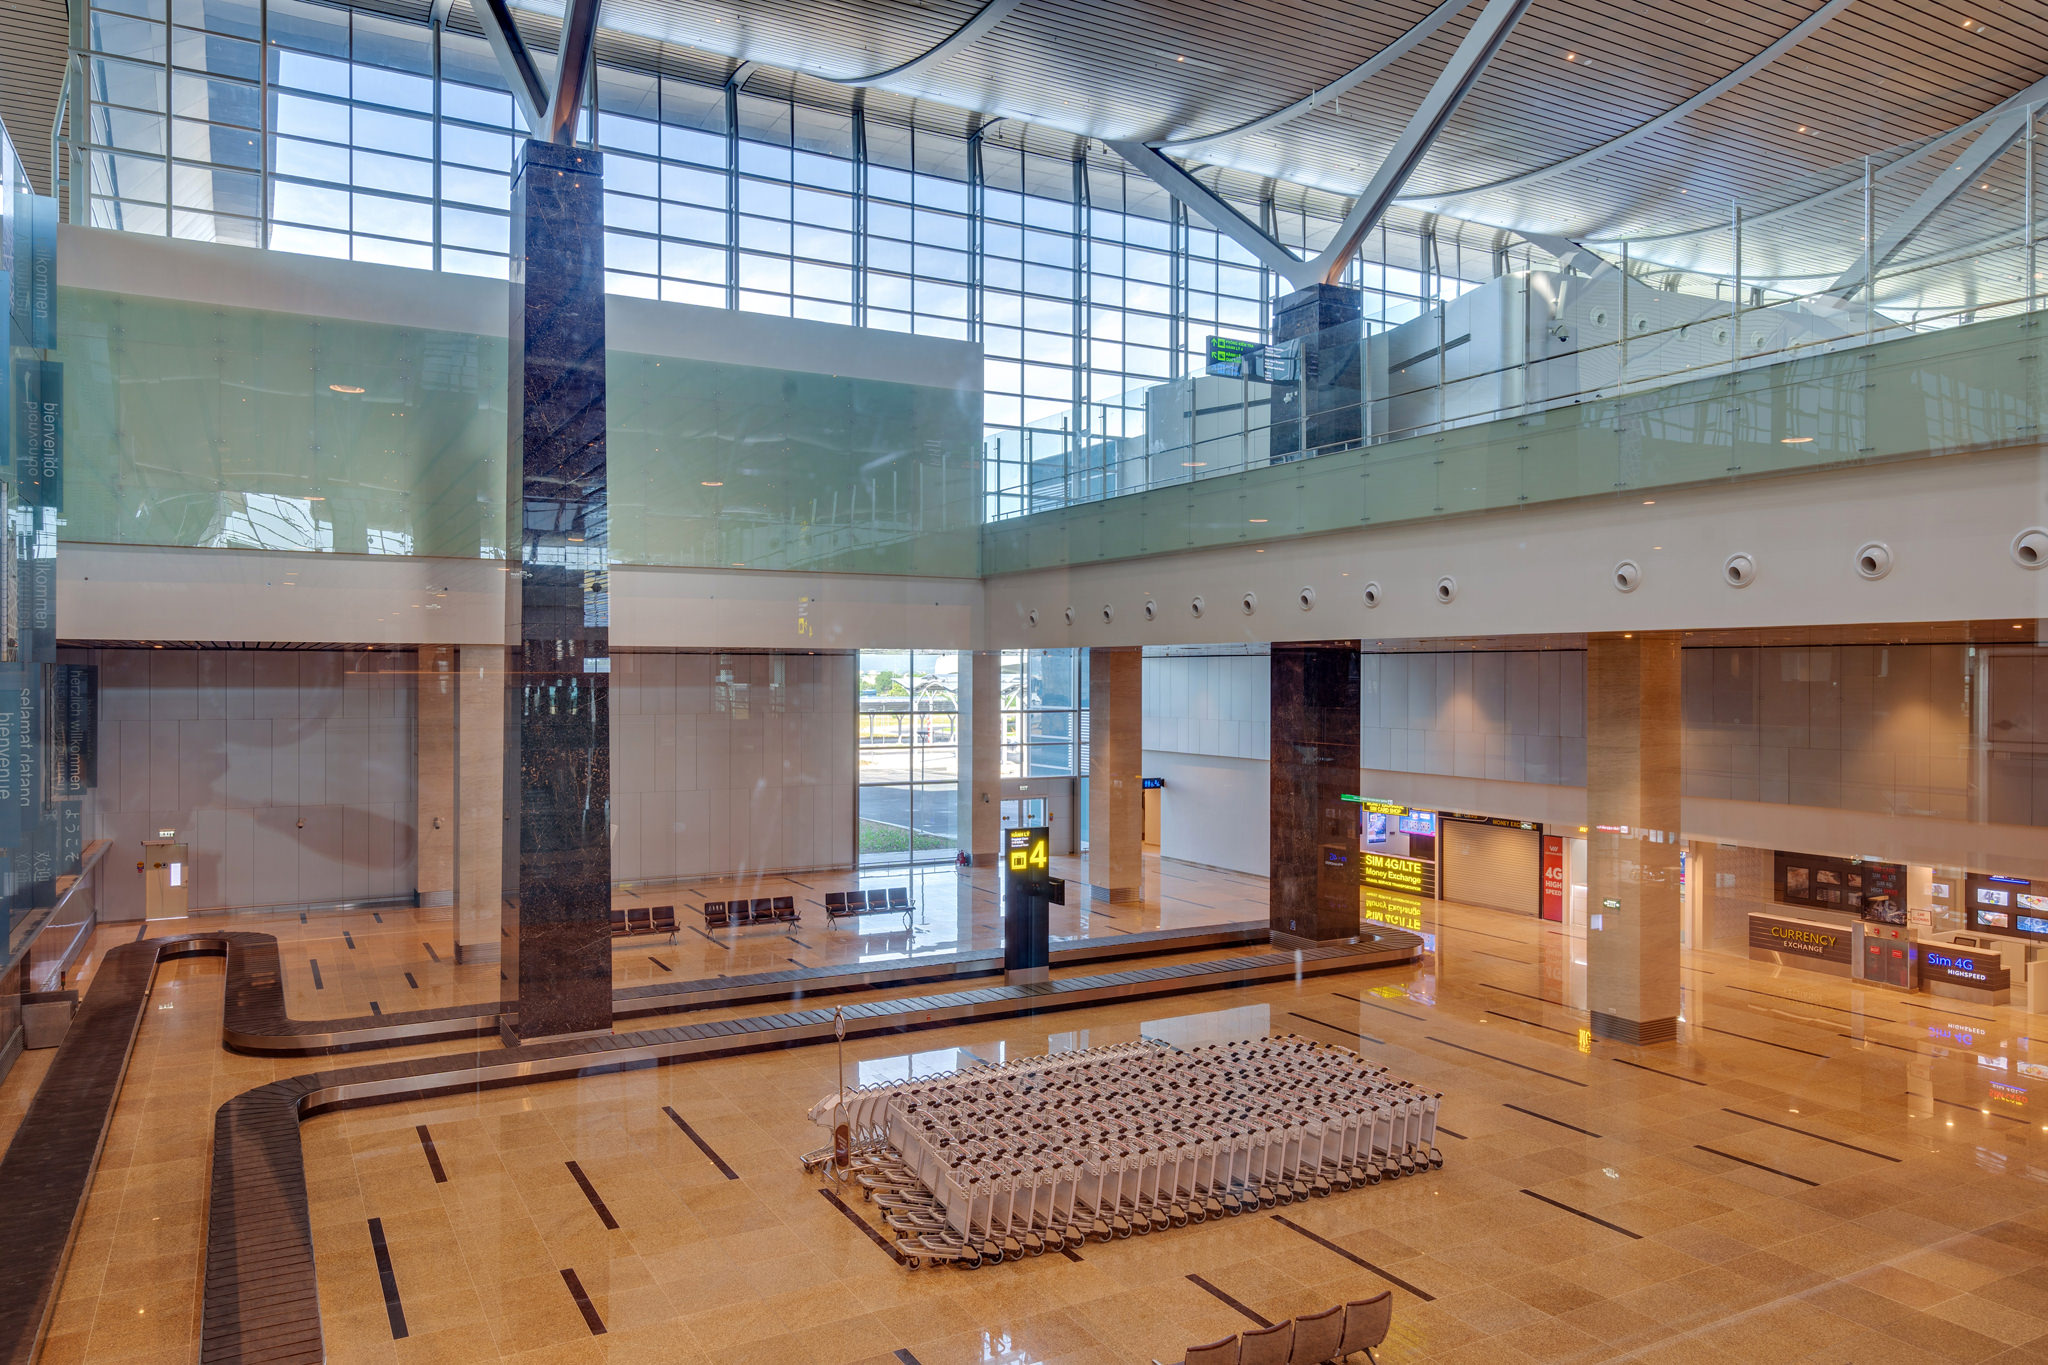 20180626 - Cam Ranh Airport - Architecture - 0154.jpg